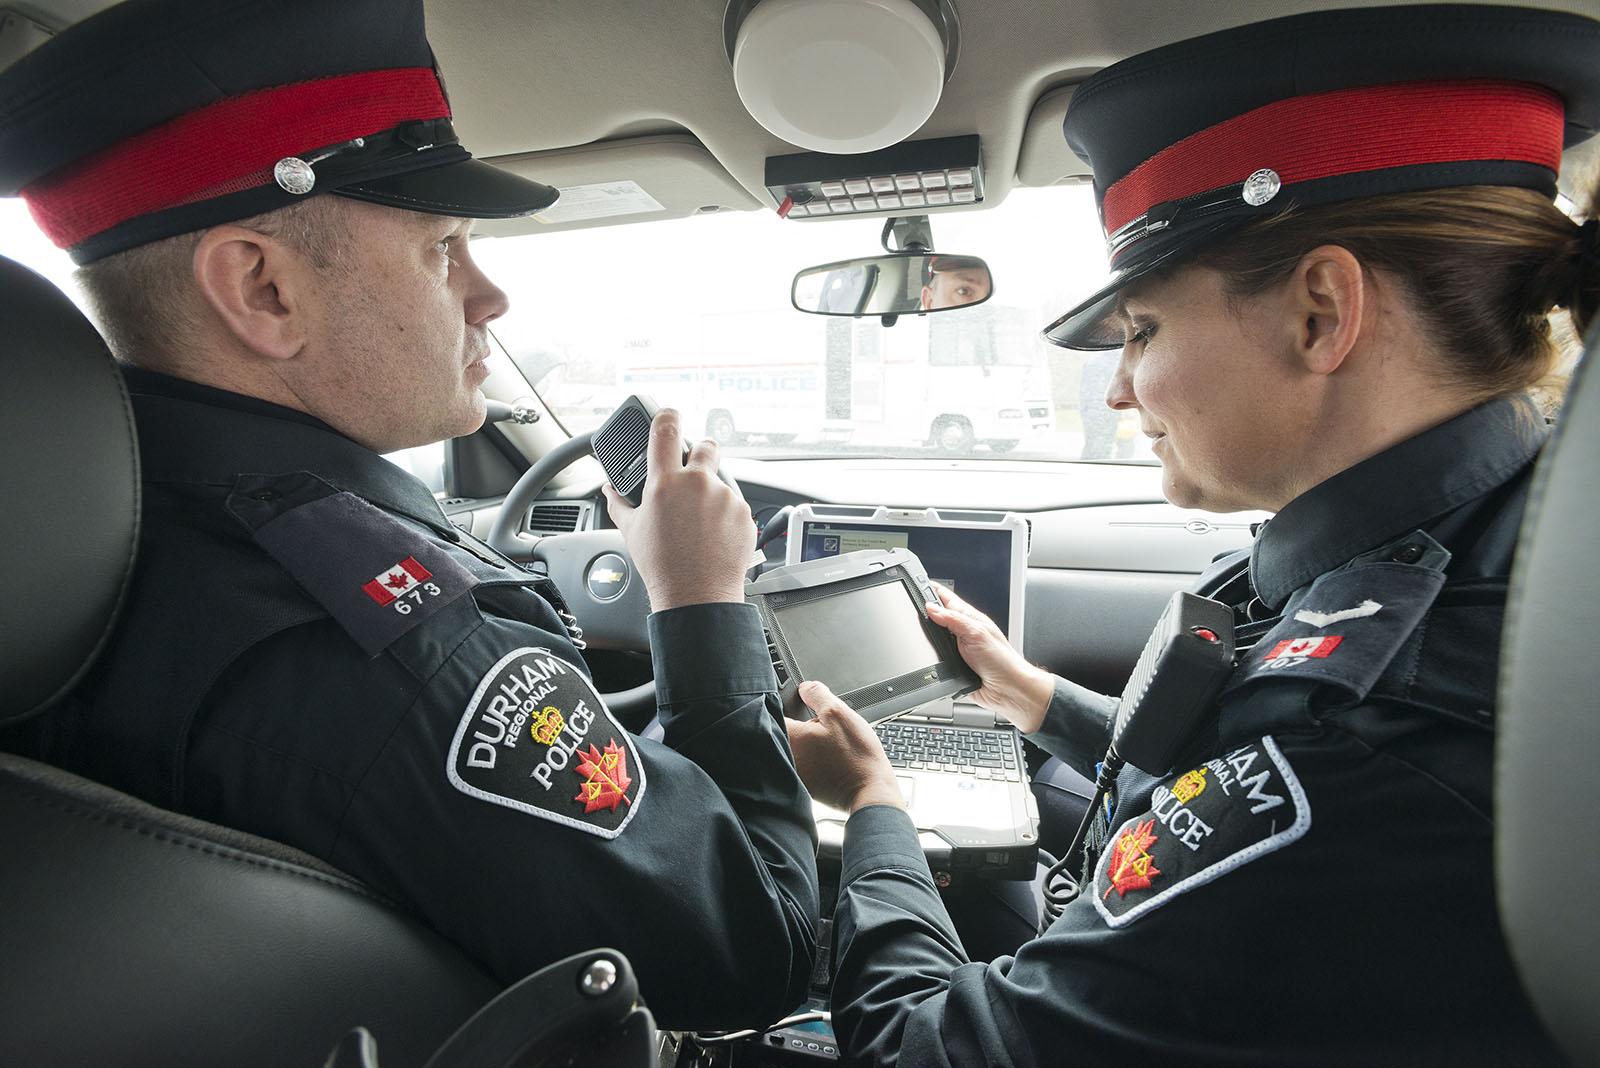 York Regional Police officers inside police cruiser